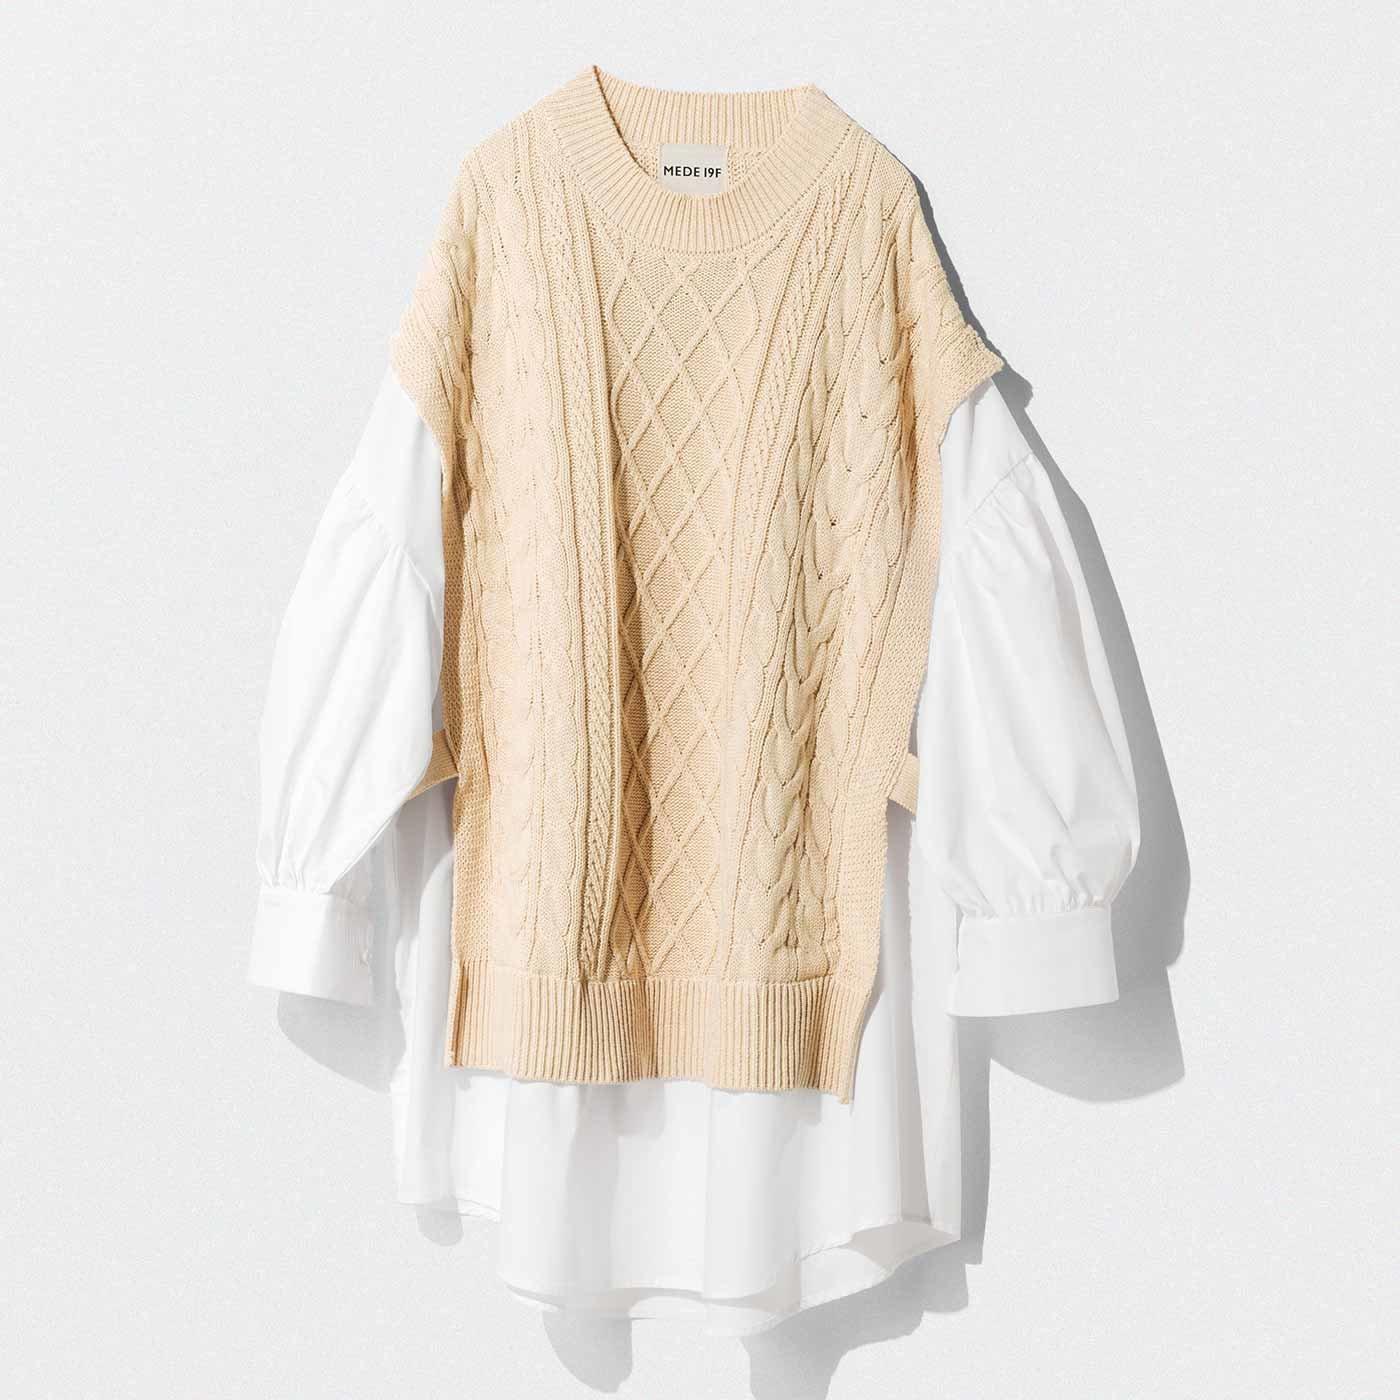 MEDE19F アラン編みニットベストのドッキングシャツトップス〈ベージュ〉